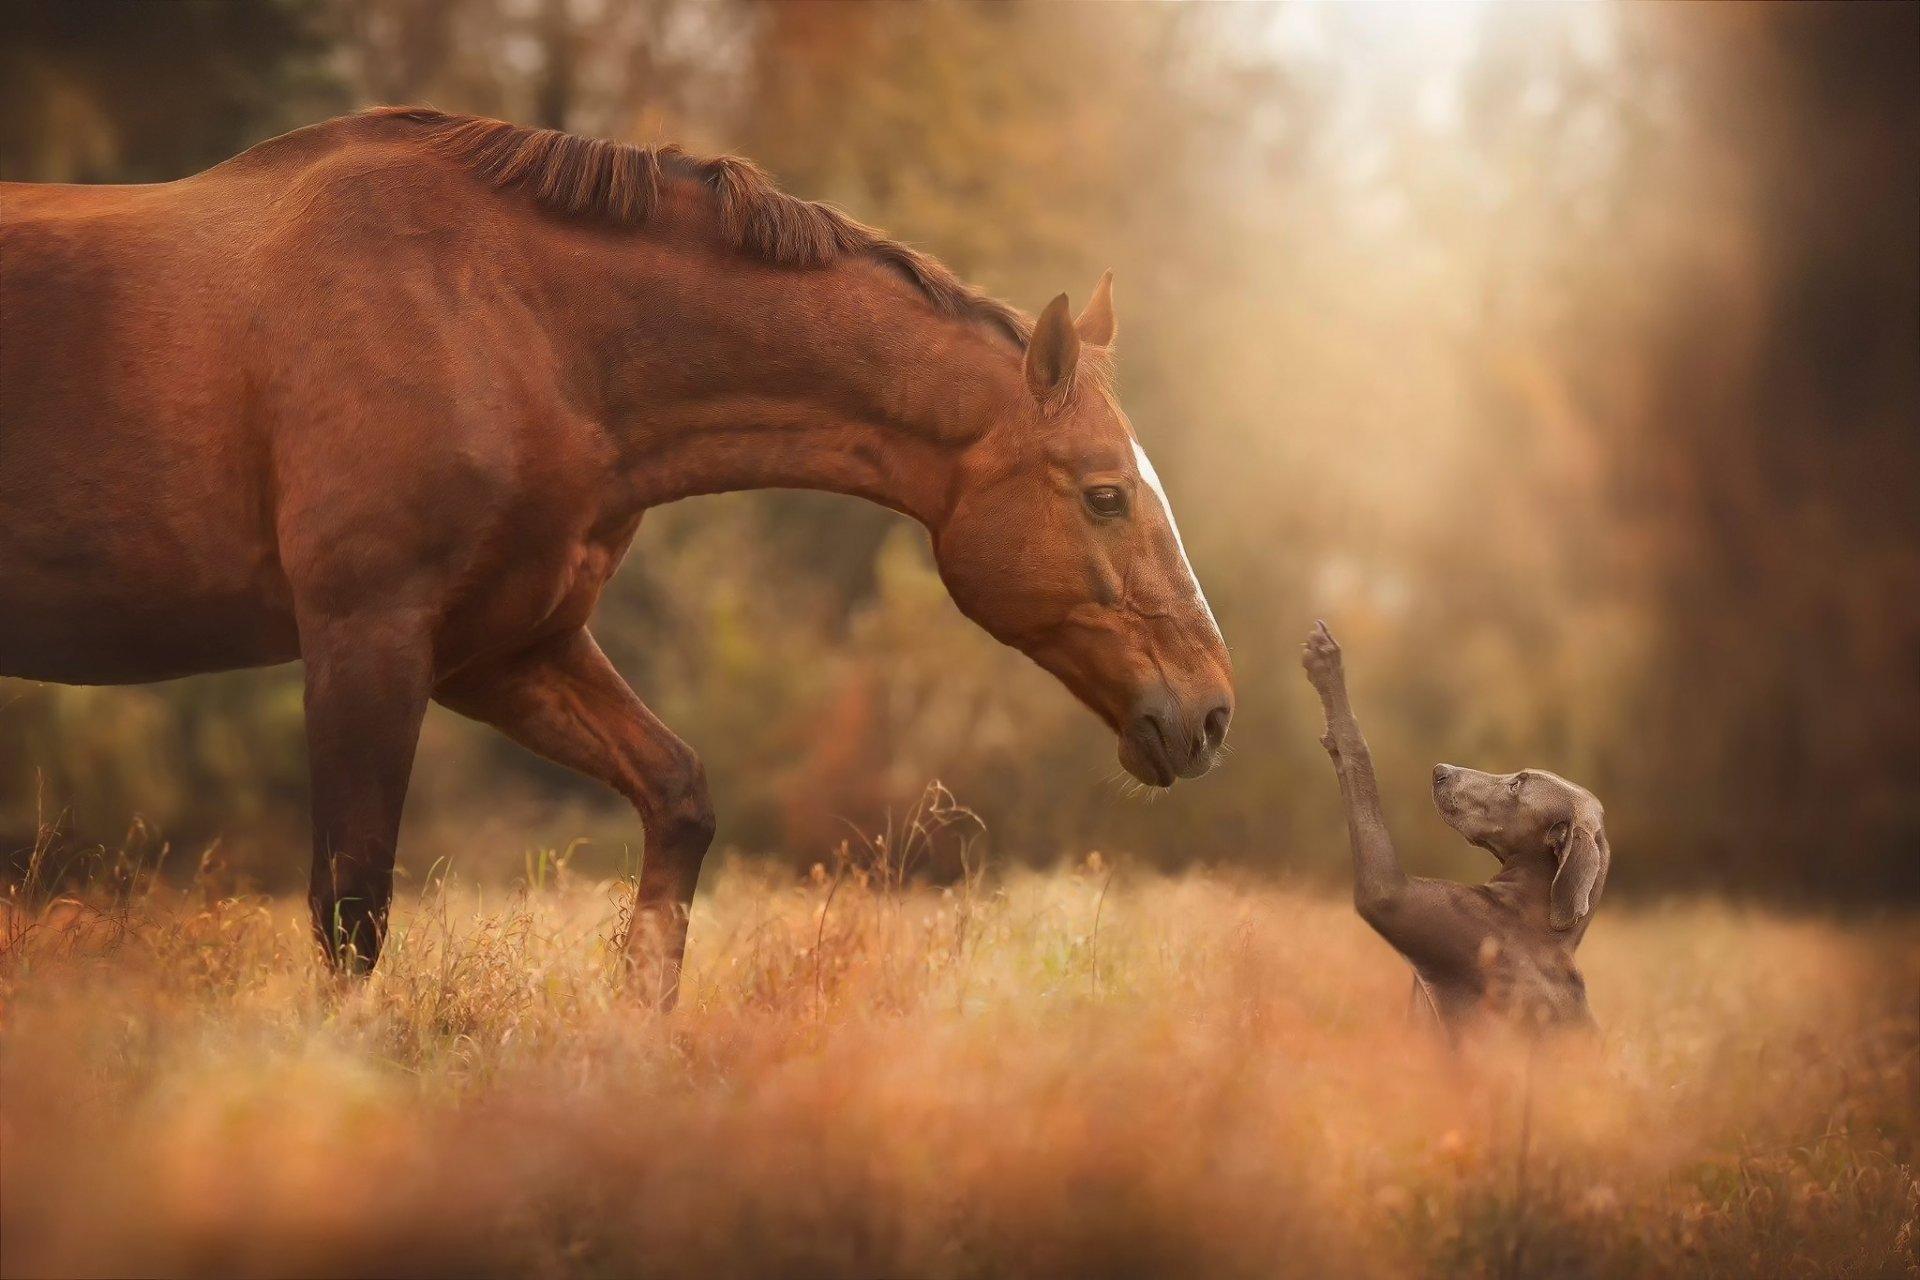 дружба лошадь и собака